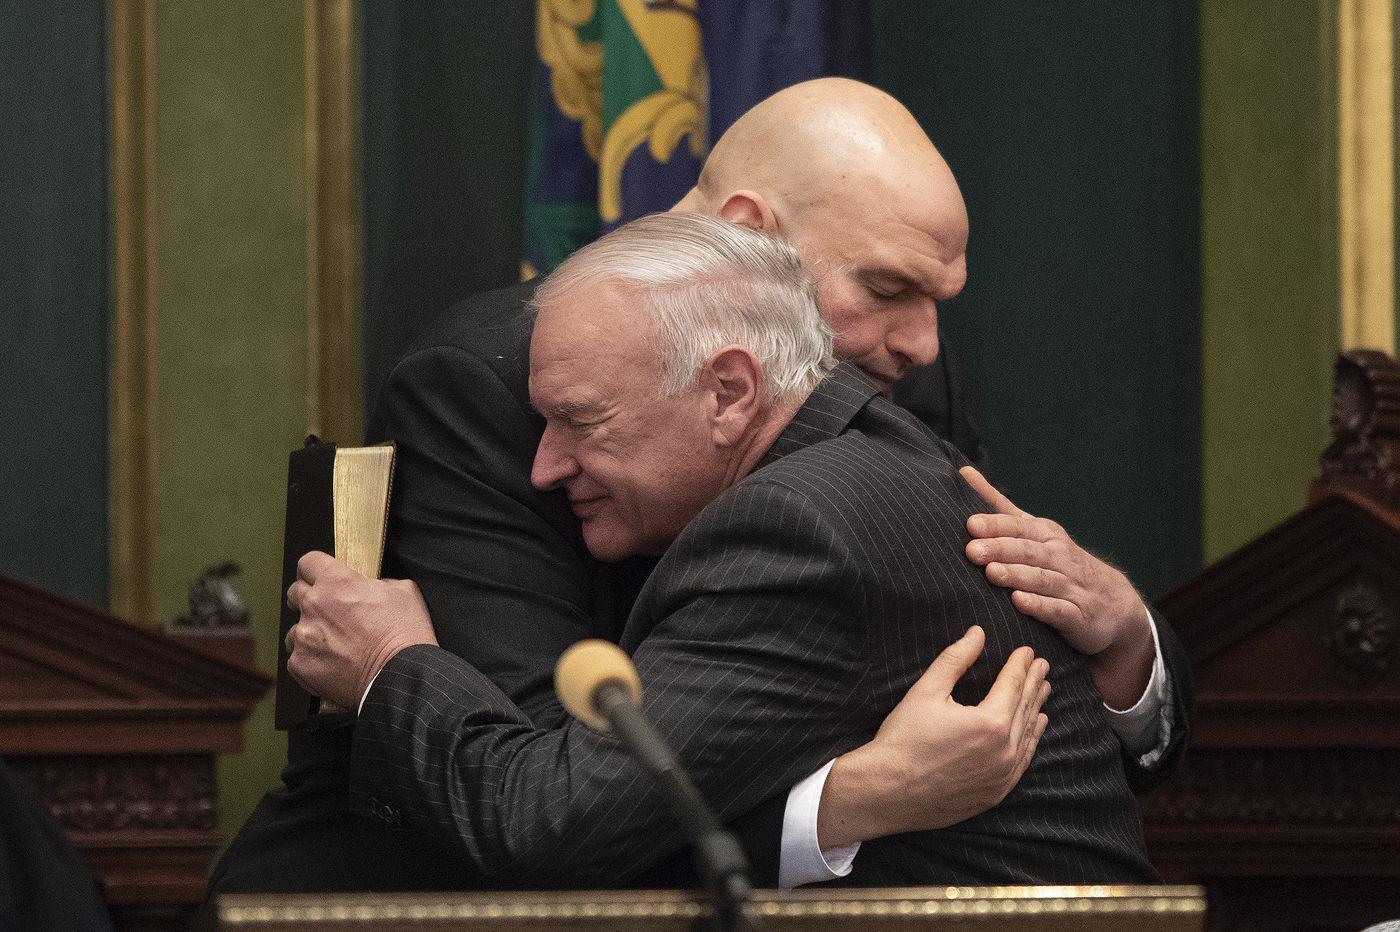 John Fetterman sworn in as Pa. lieutenant governor, promises 'bipartisan spirit'